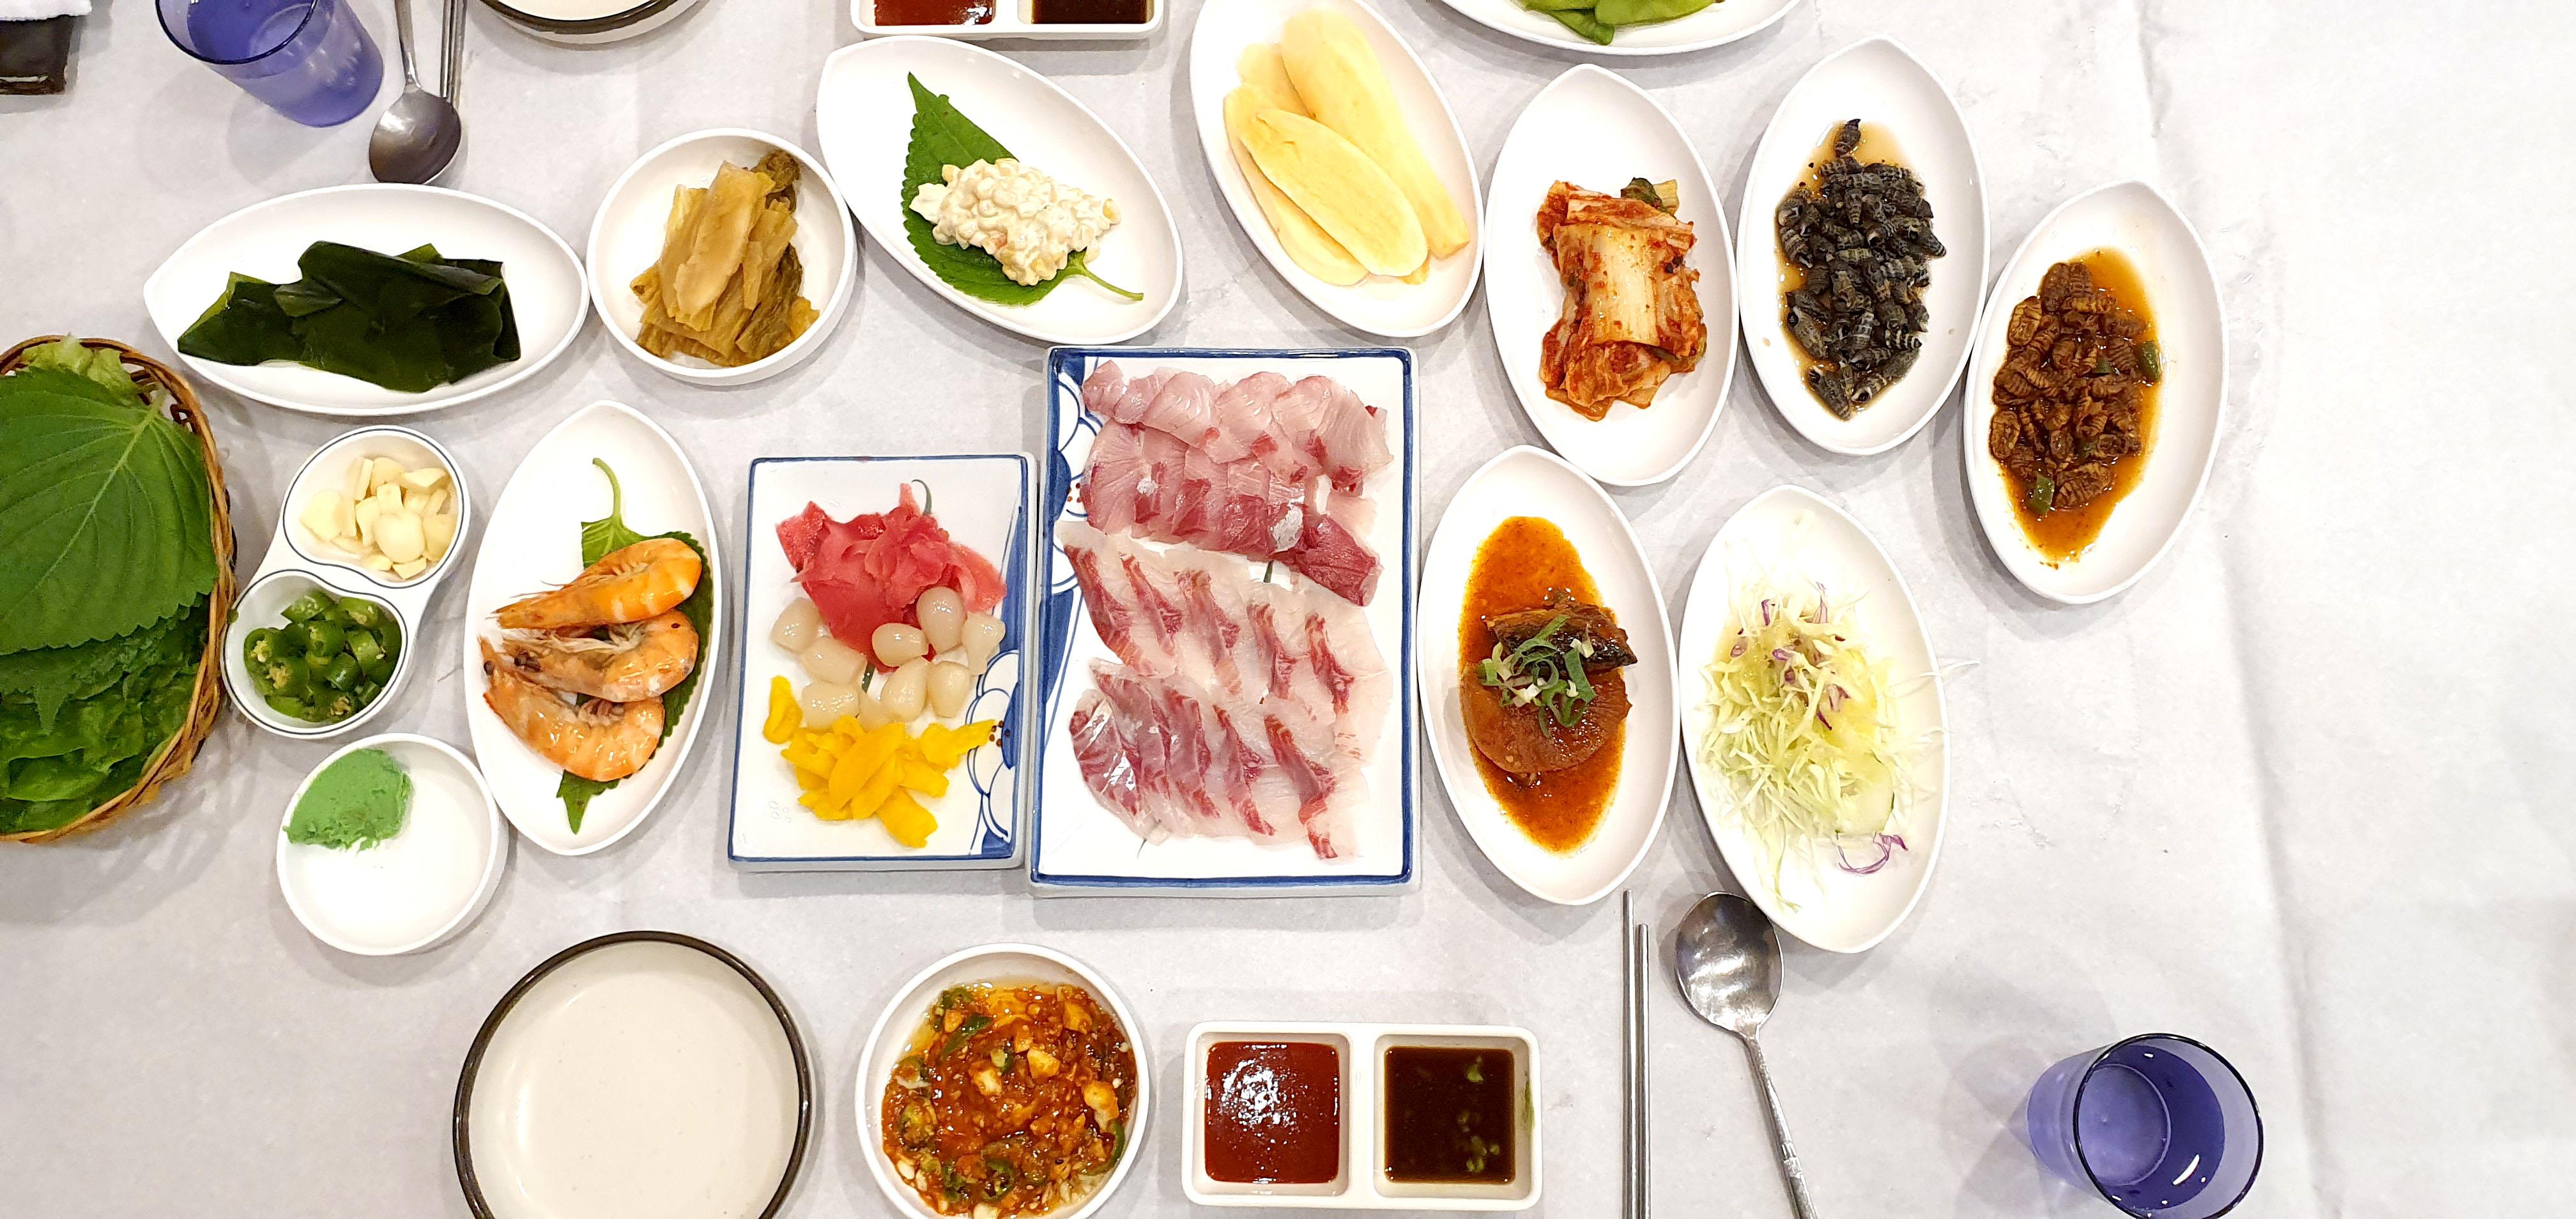 Sewoogo tish sashimi(세우고 횟집)